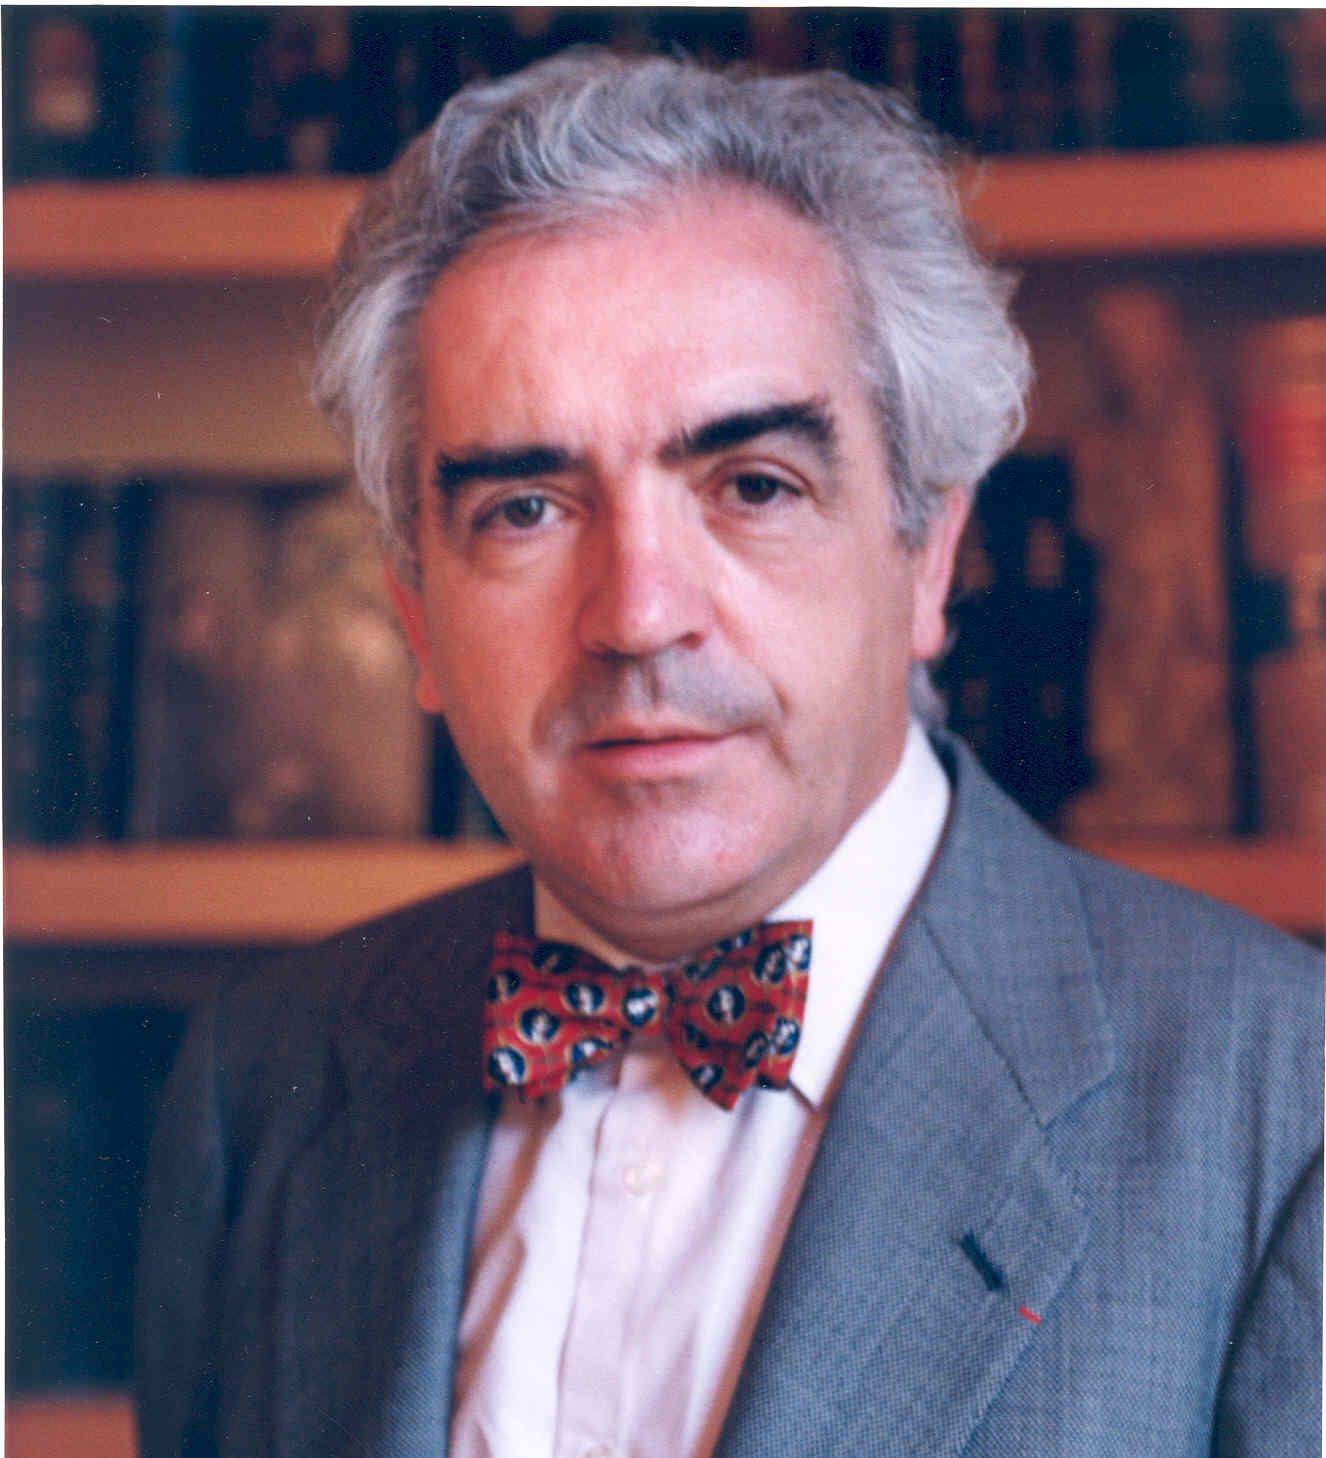 Mr. Juan Antonio Cremades Sanz-Pastor